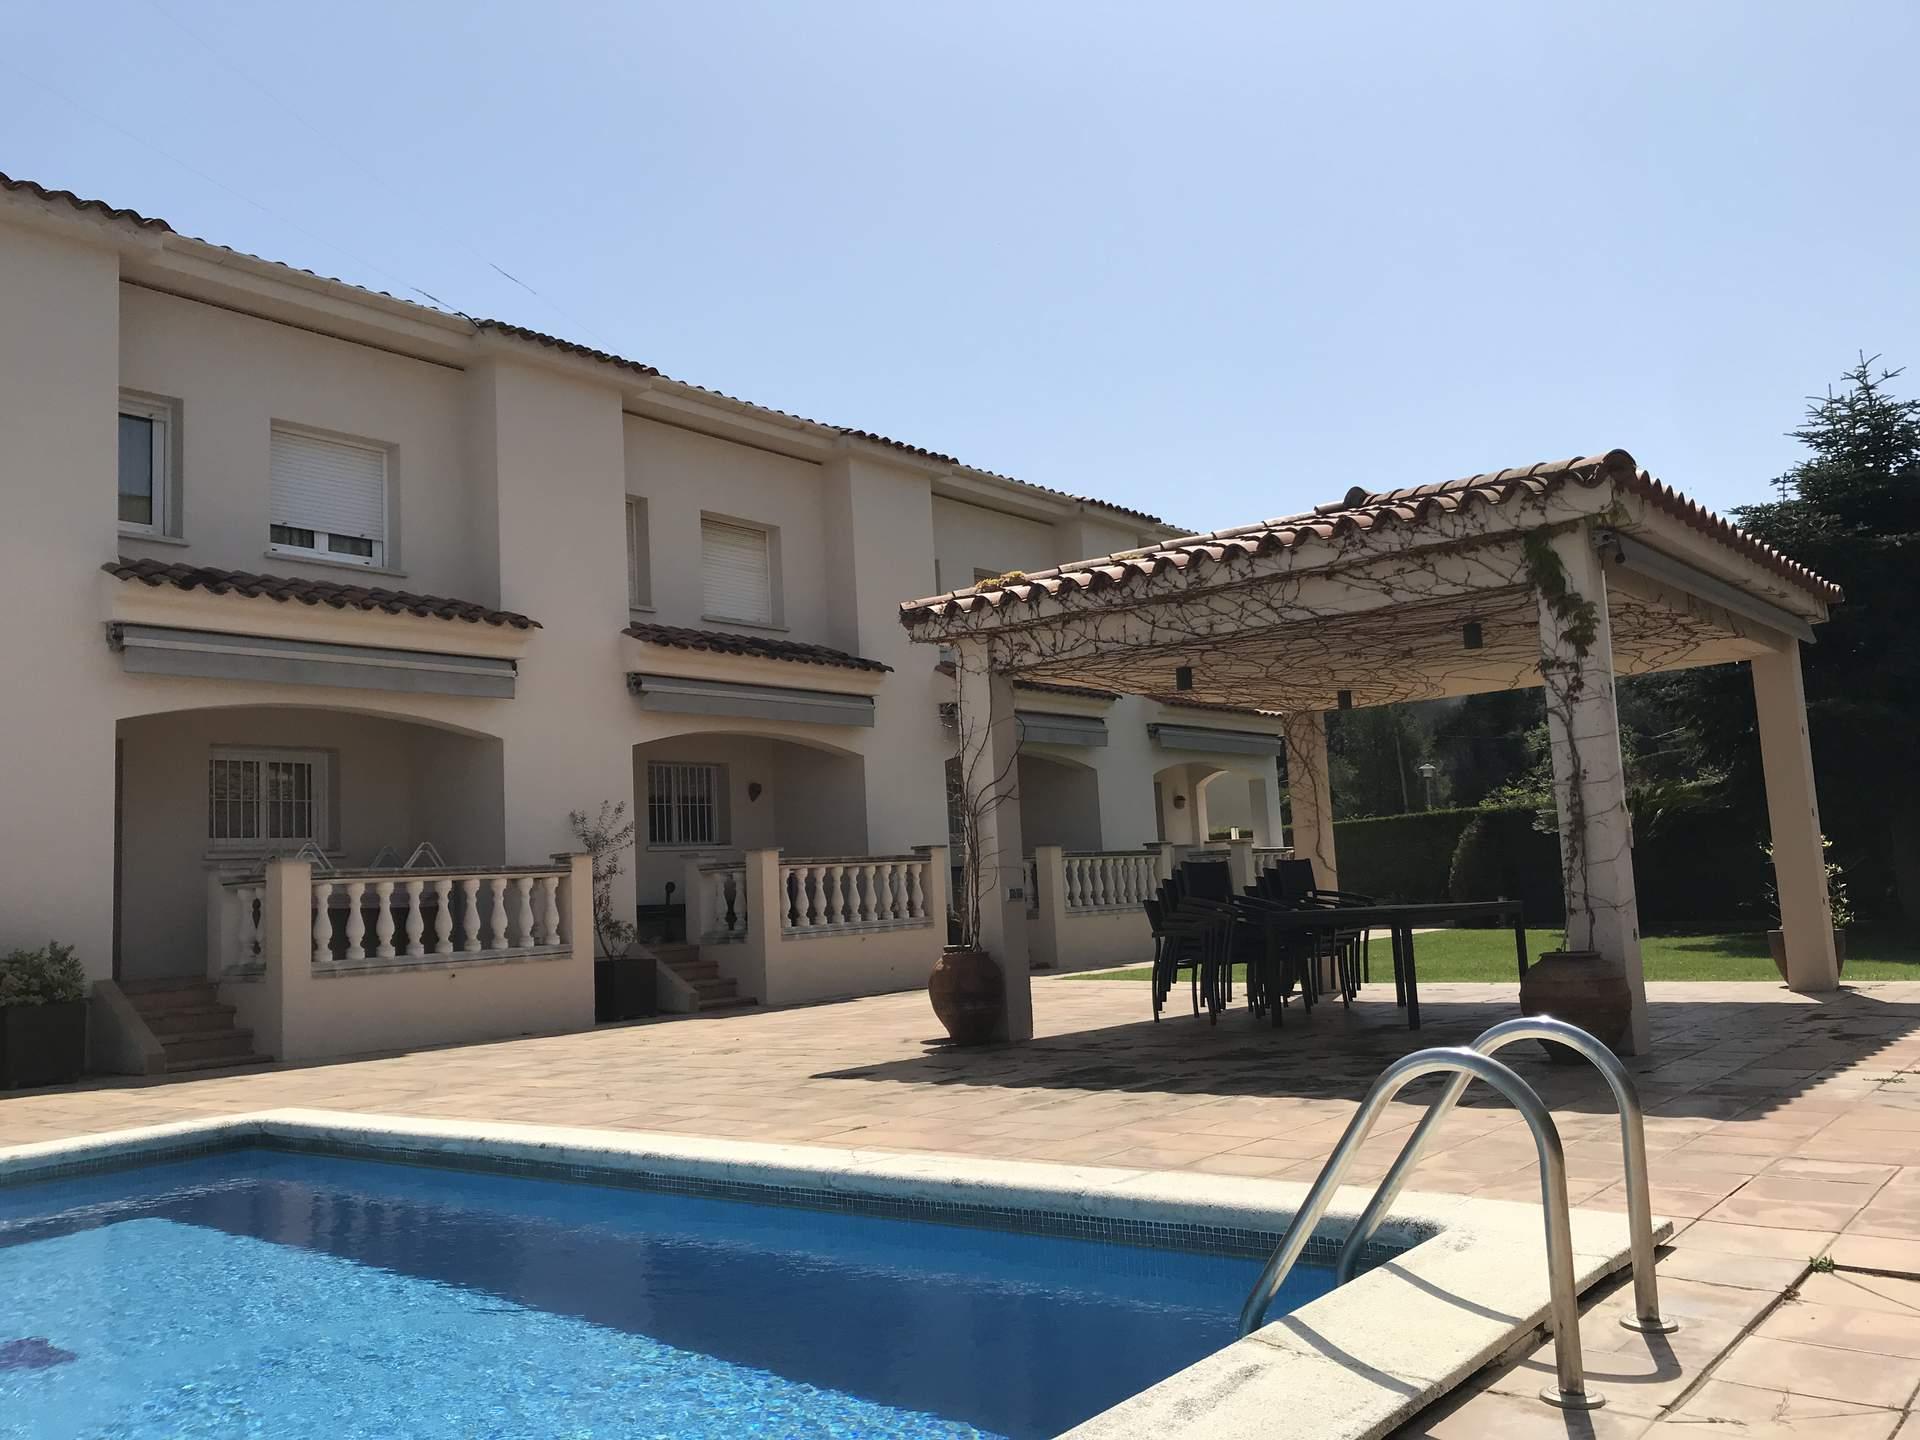 Location vacances Maison La Fosca